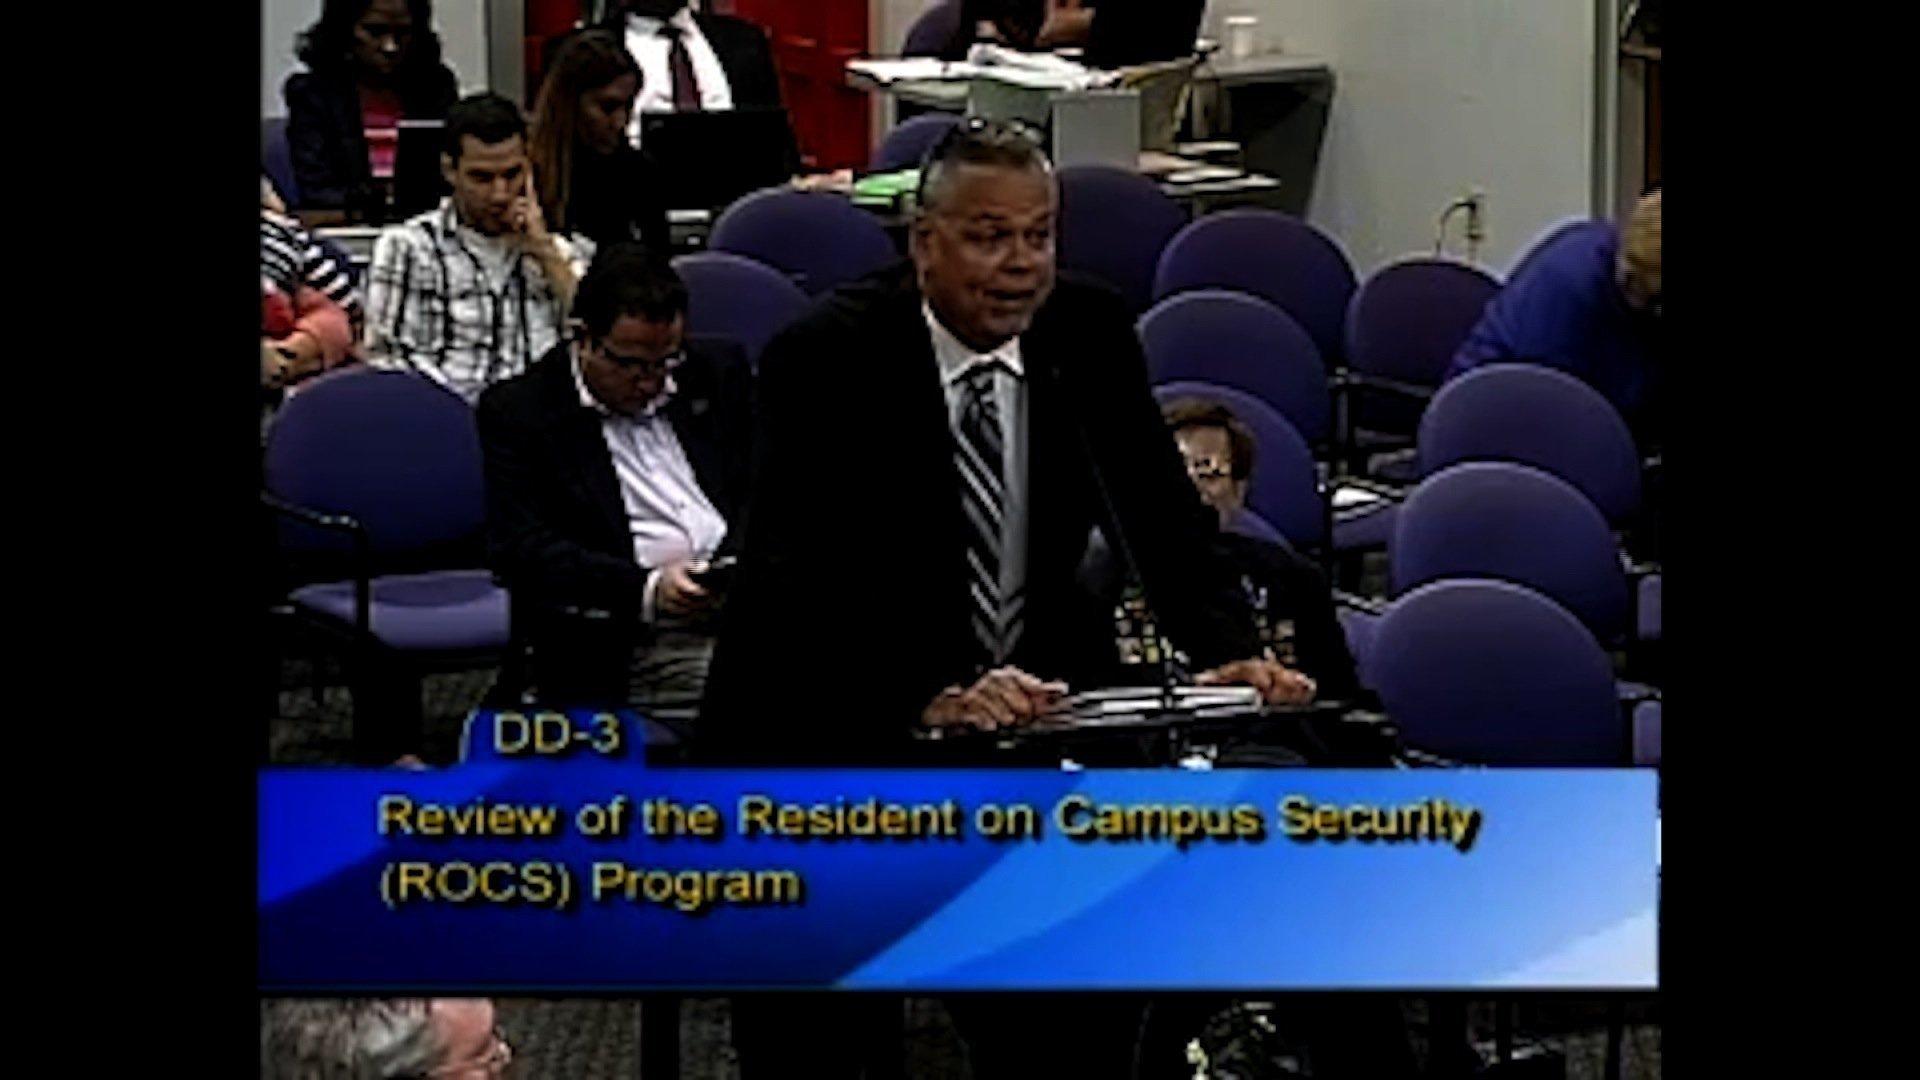 Campus deputy didn't enter building during Parkland school shooting